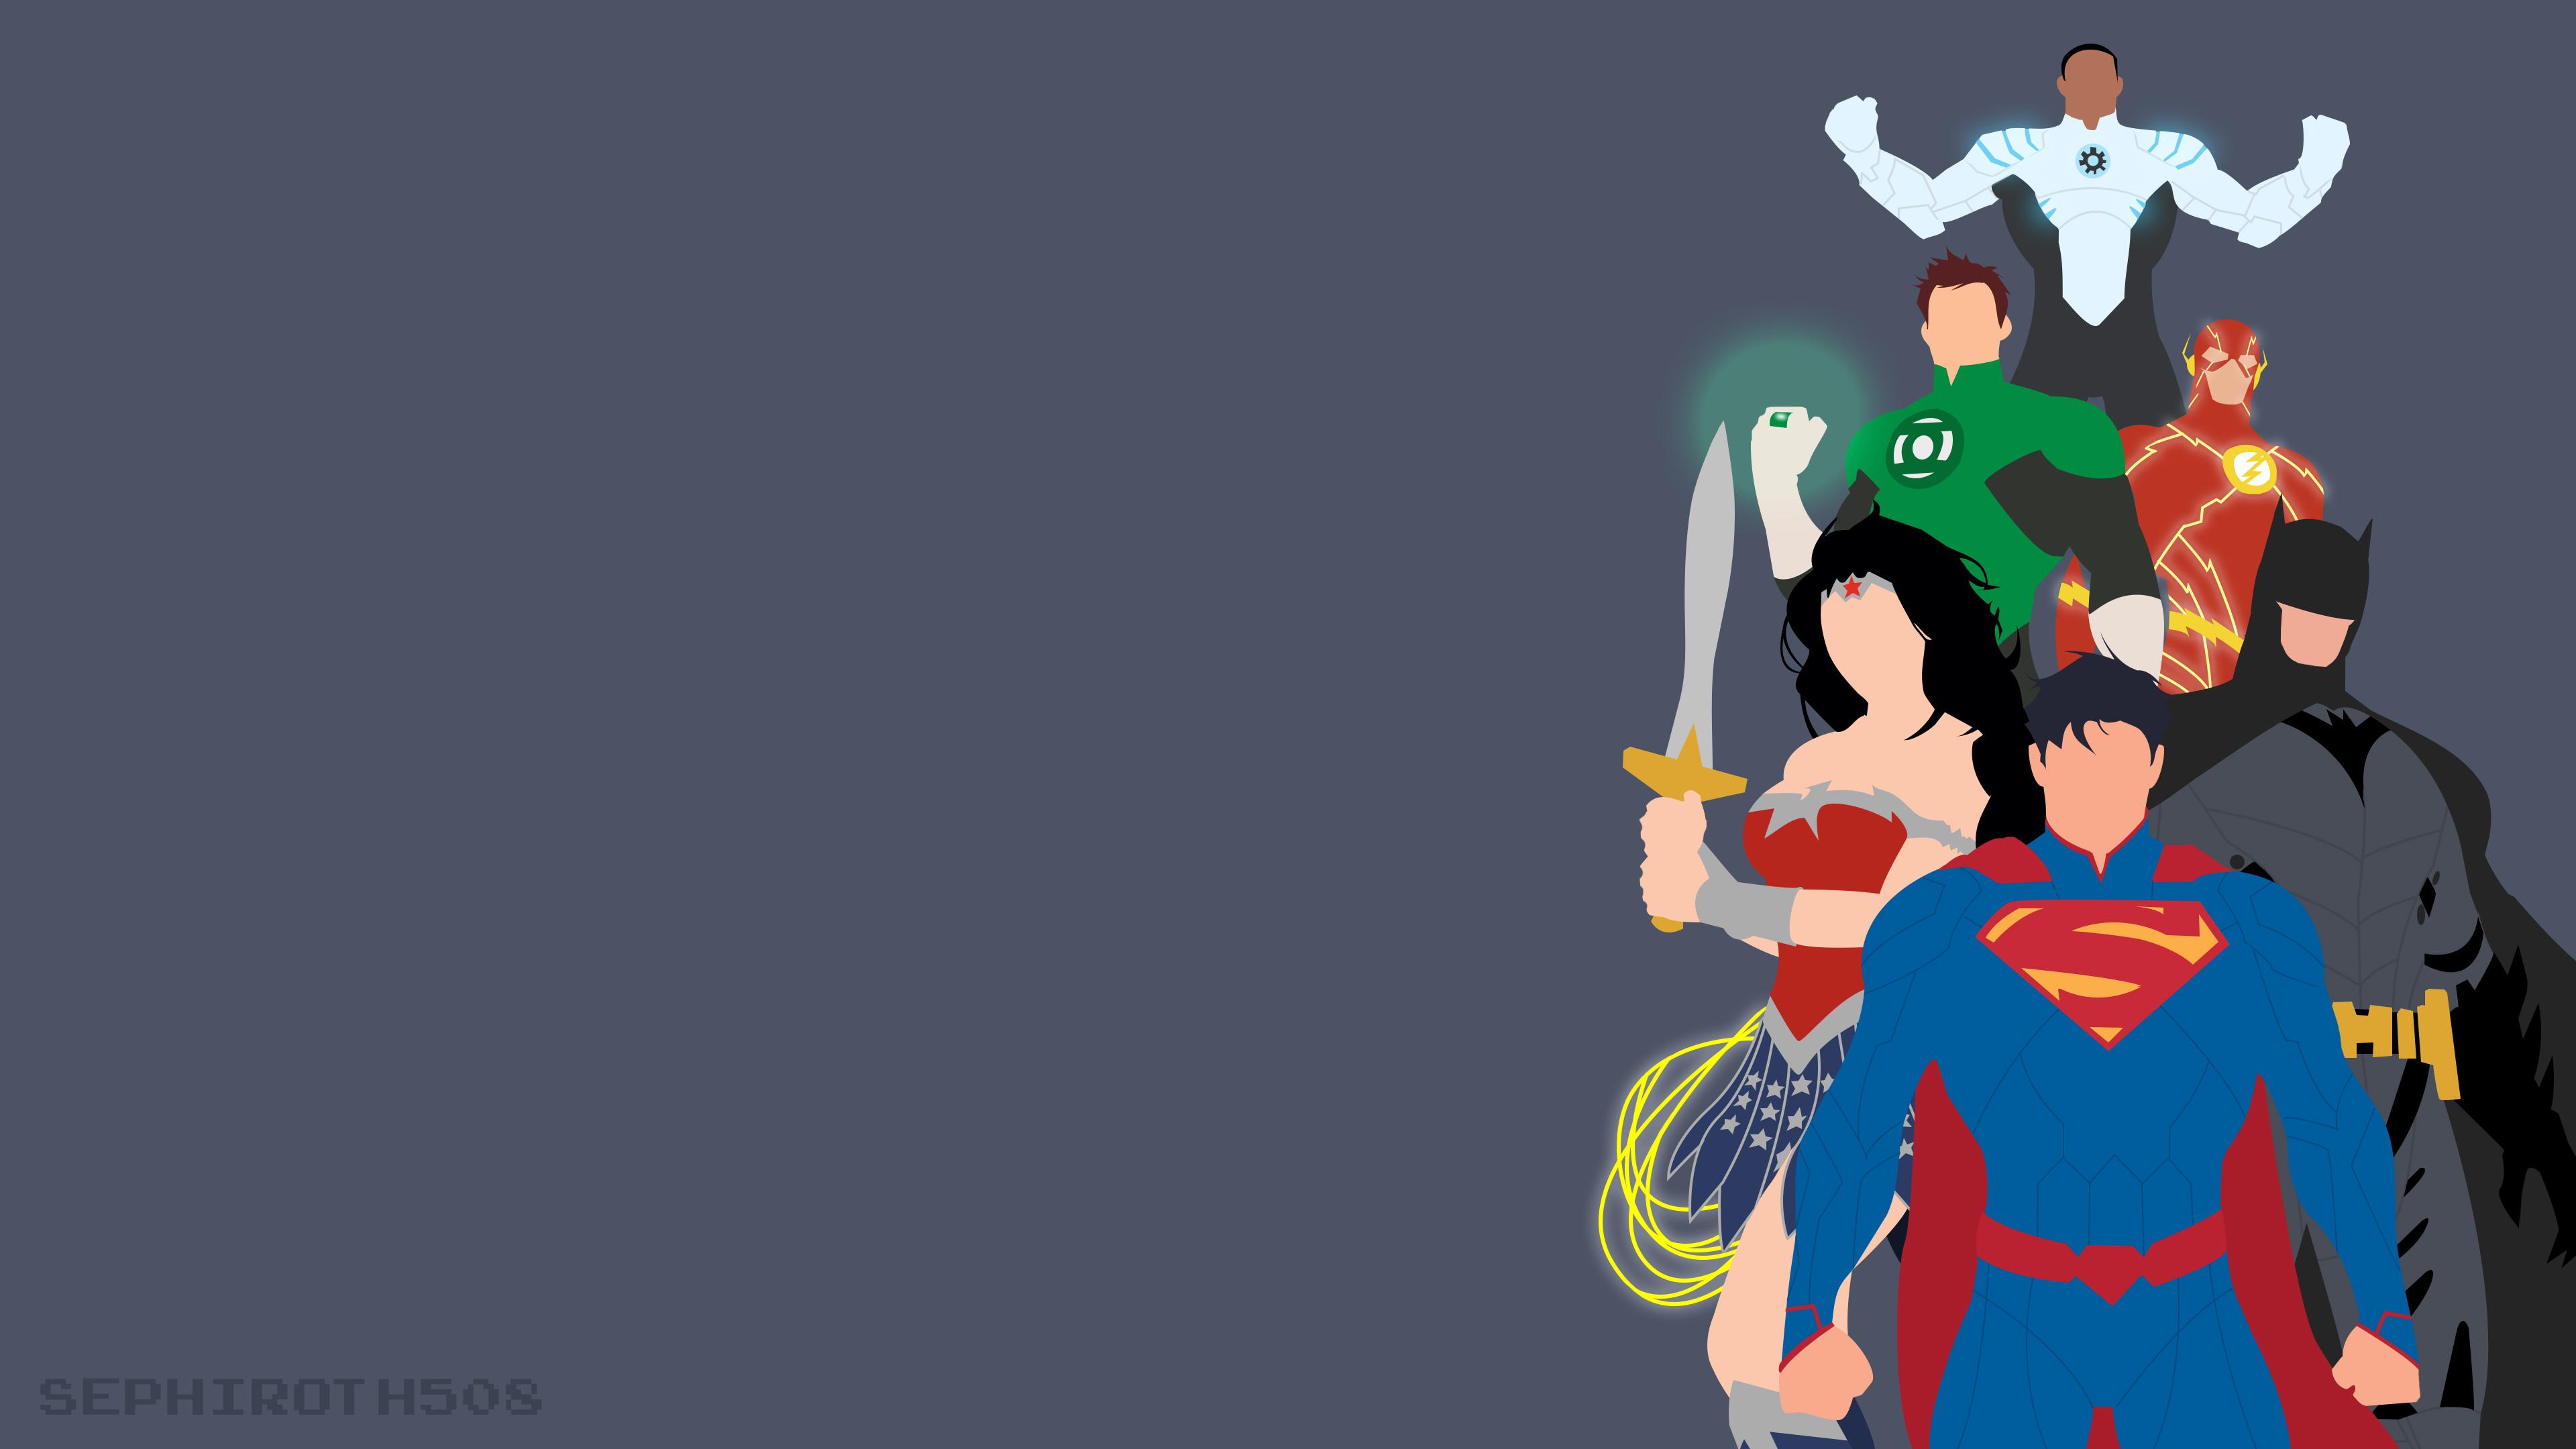 justice league minimalist hd superheroes 4k wallpapers